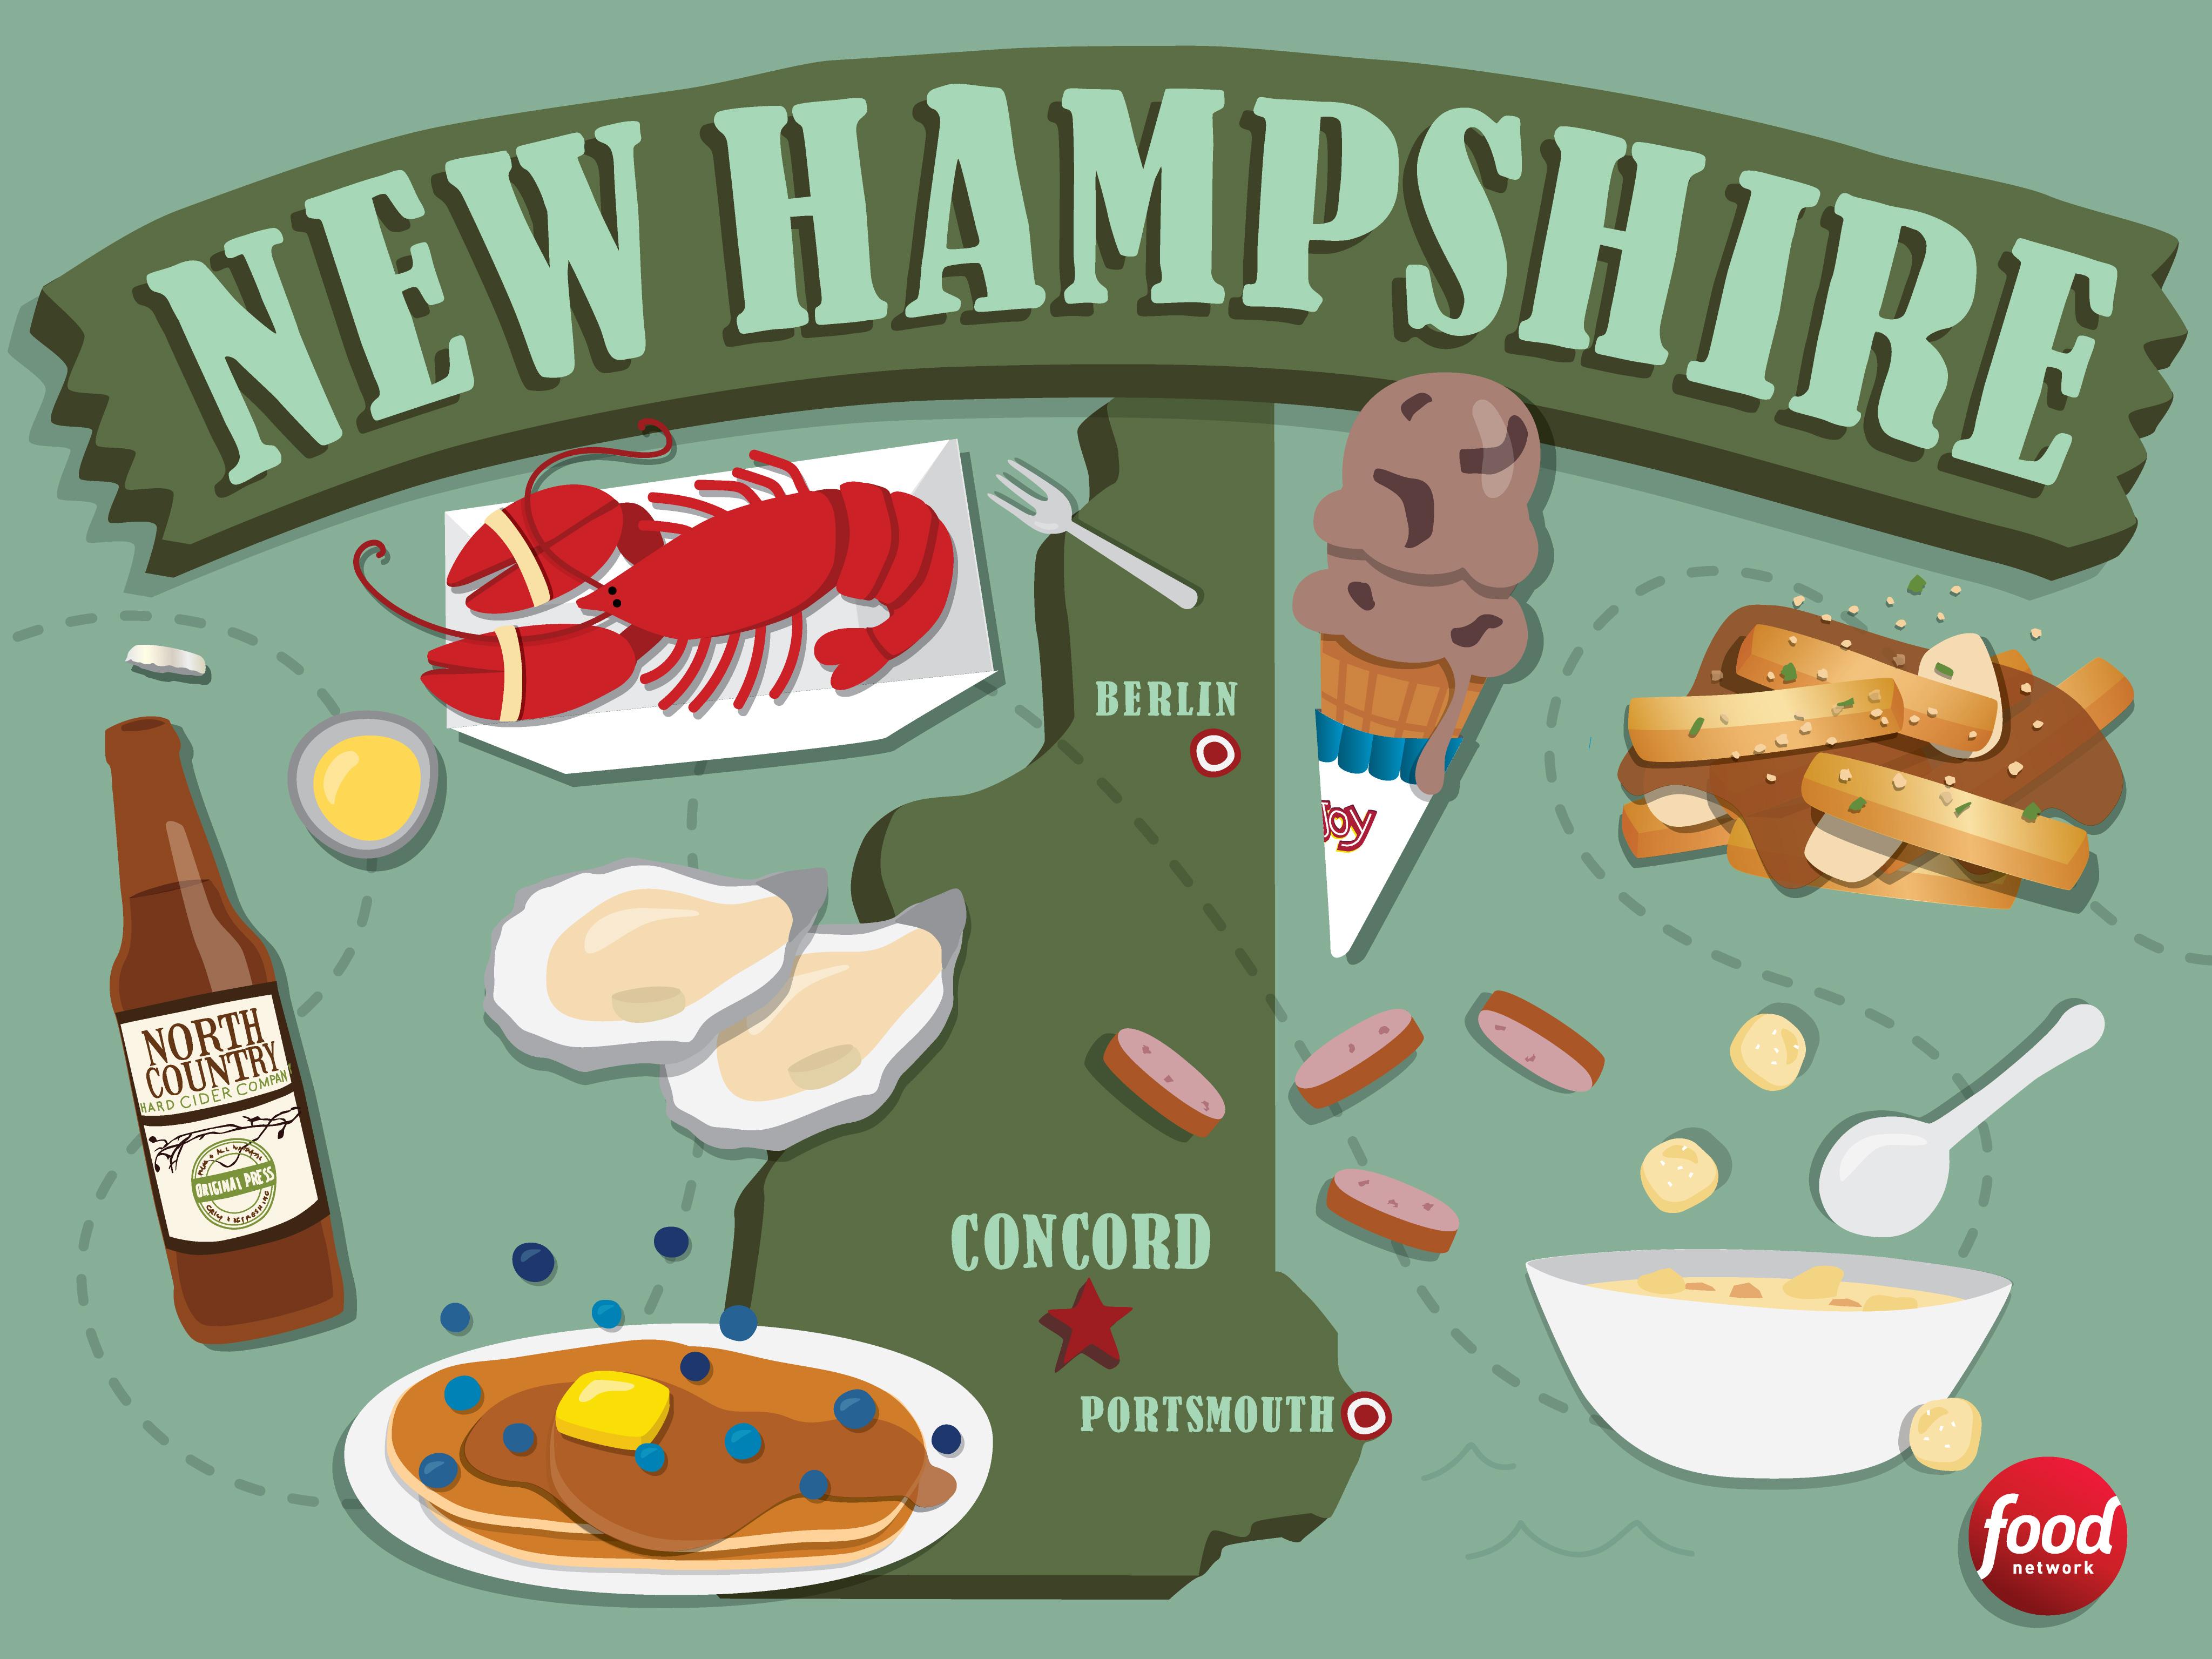 new hamshire food